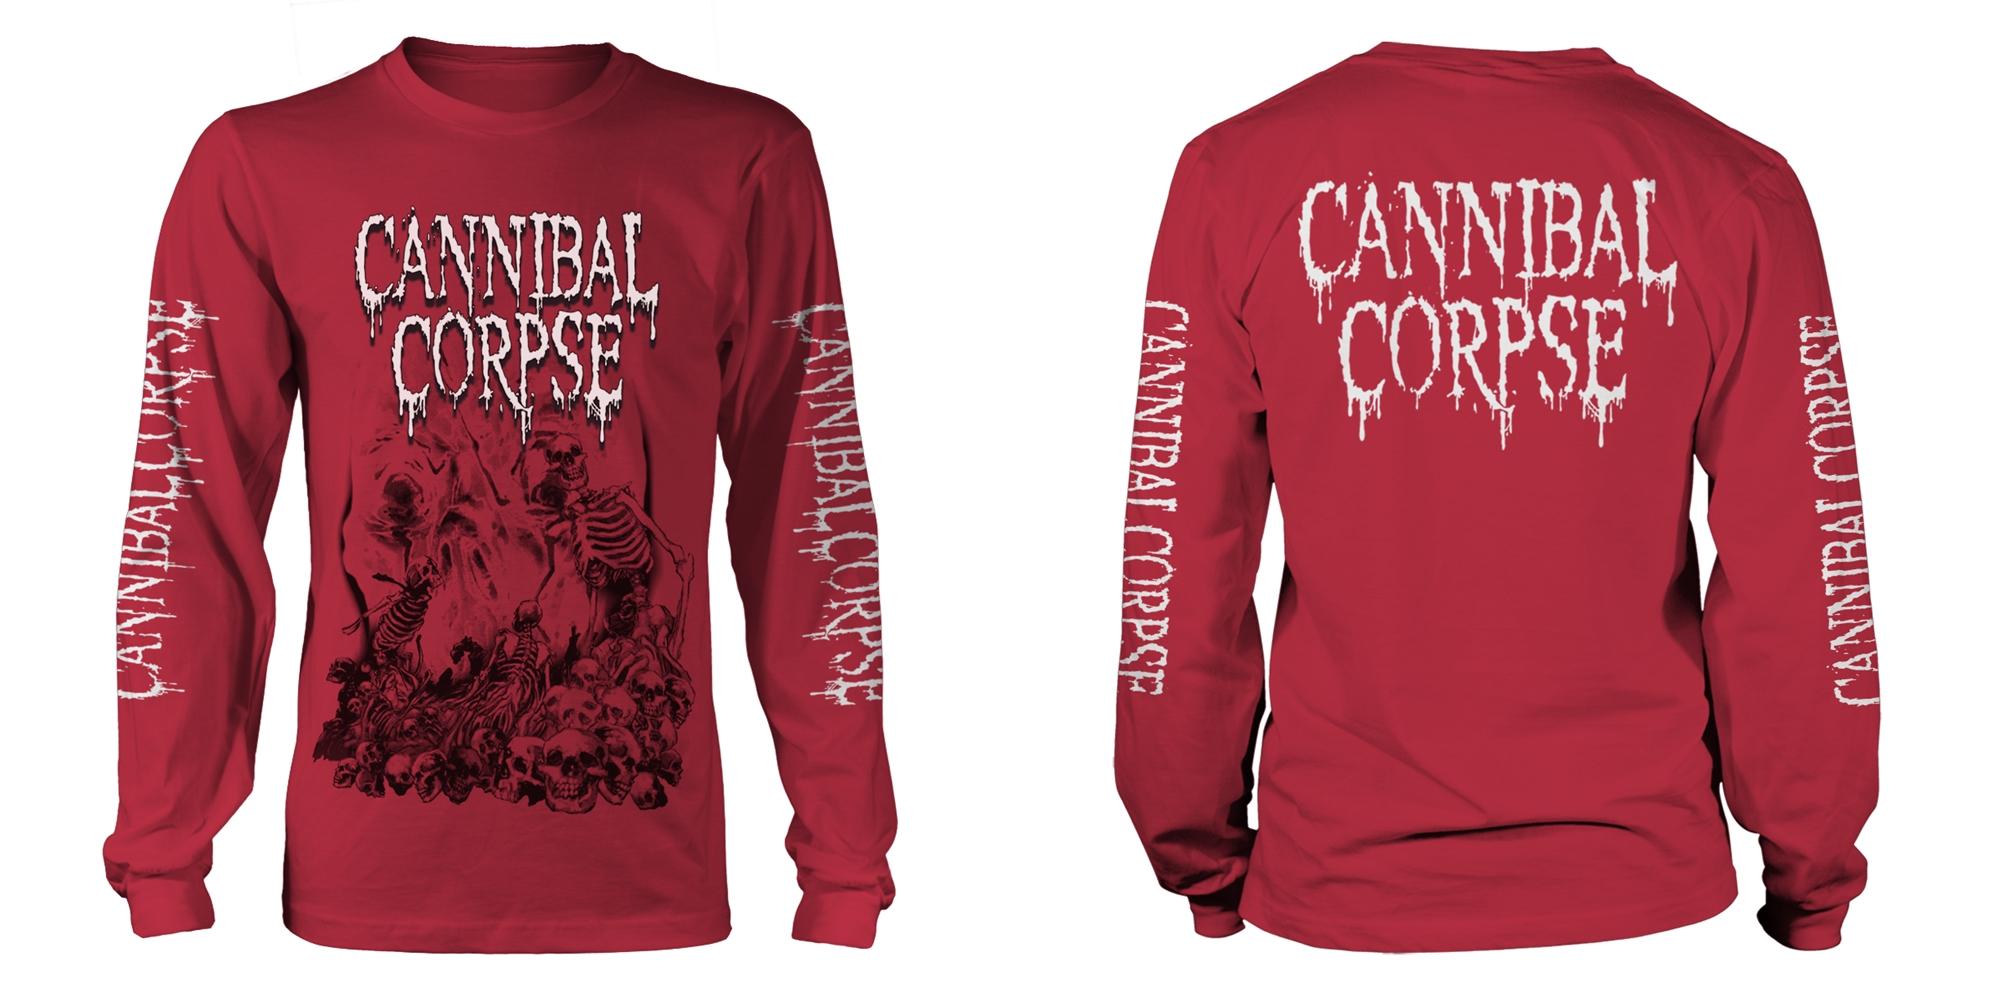 Herrenmode Aus Dem Ausland Importiert Cannibal Corpse Fanartikel & Merchandise Pile Of Skulls 2018 Red T-shirt